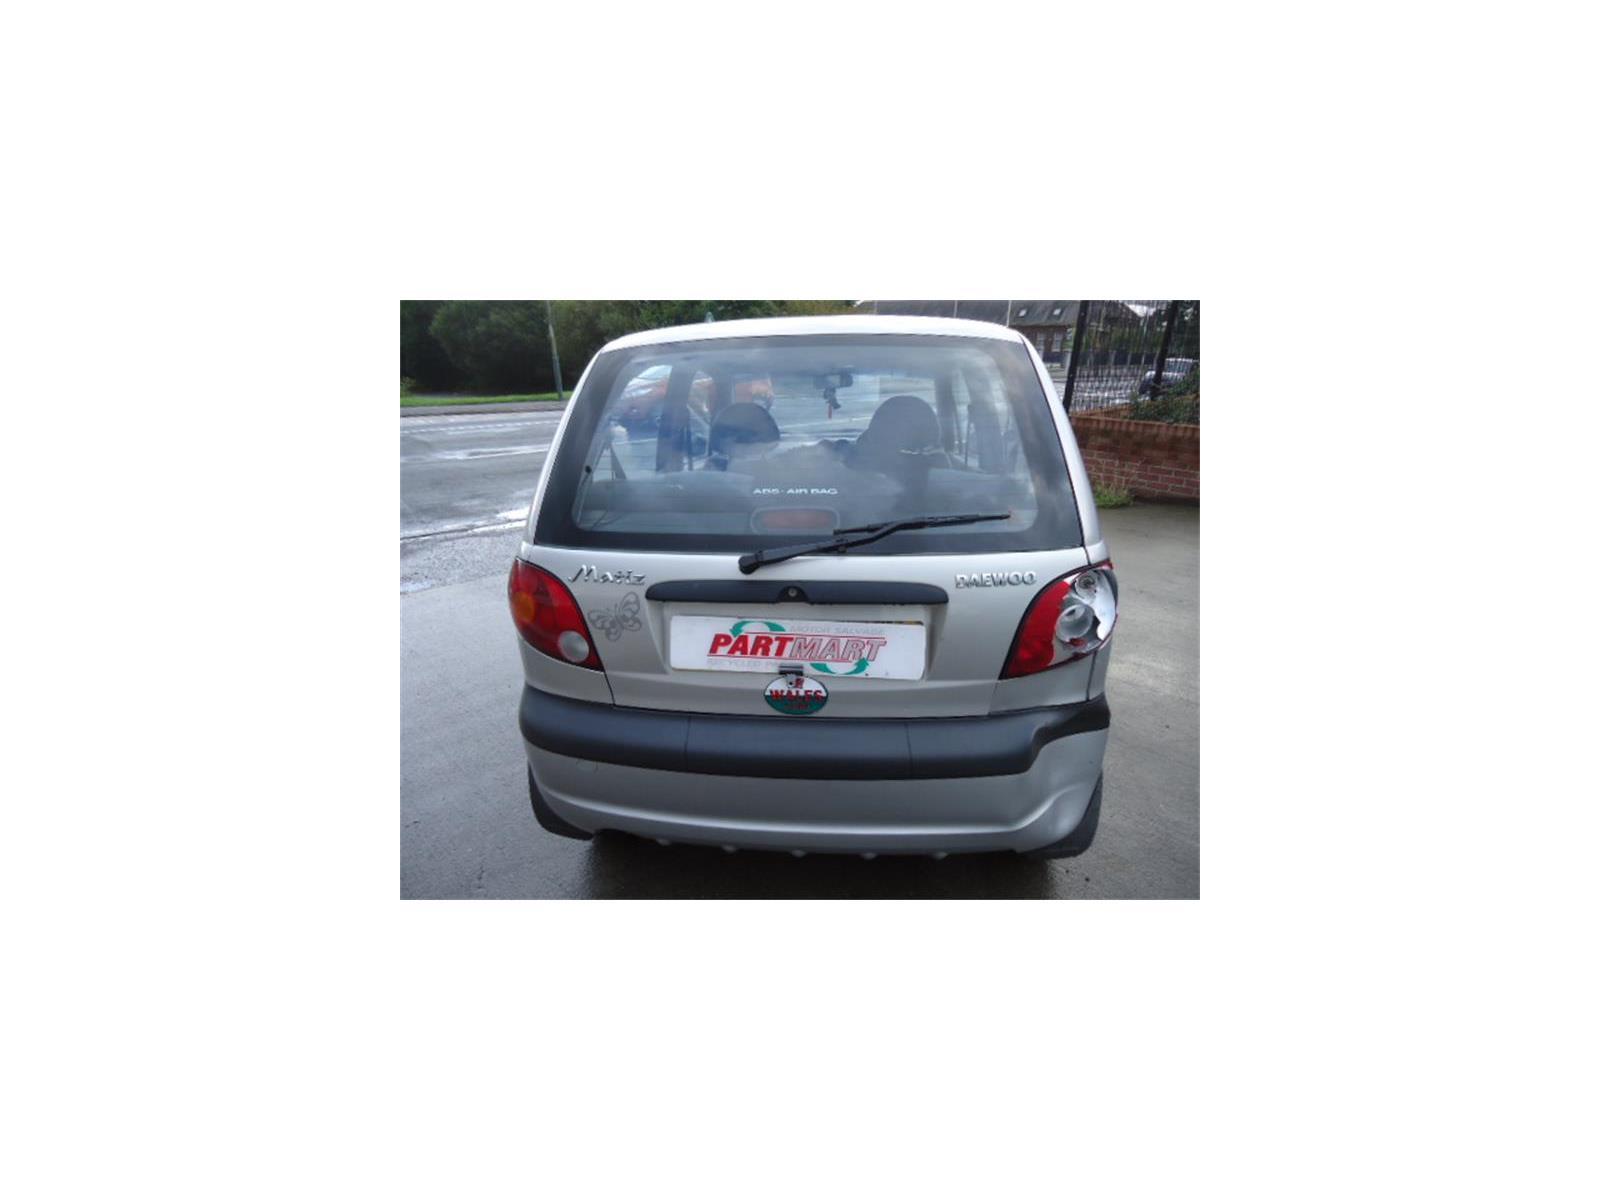 2004 Daewoo Matiz 1998 To 5 Door Hatchback Petrol Manual